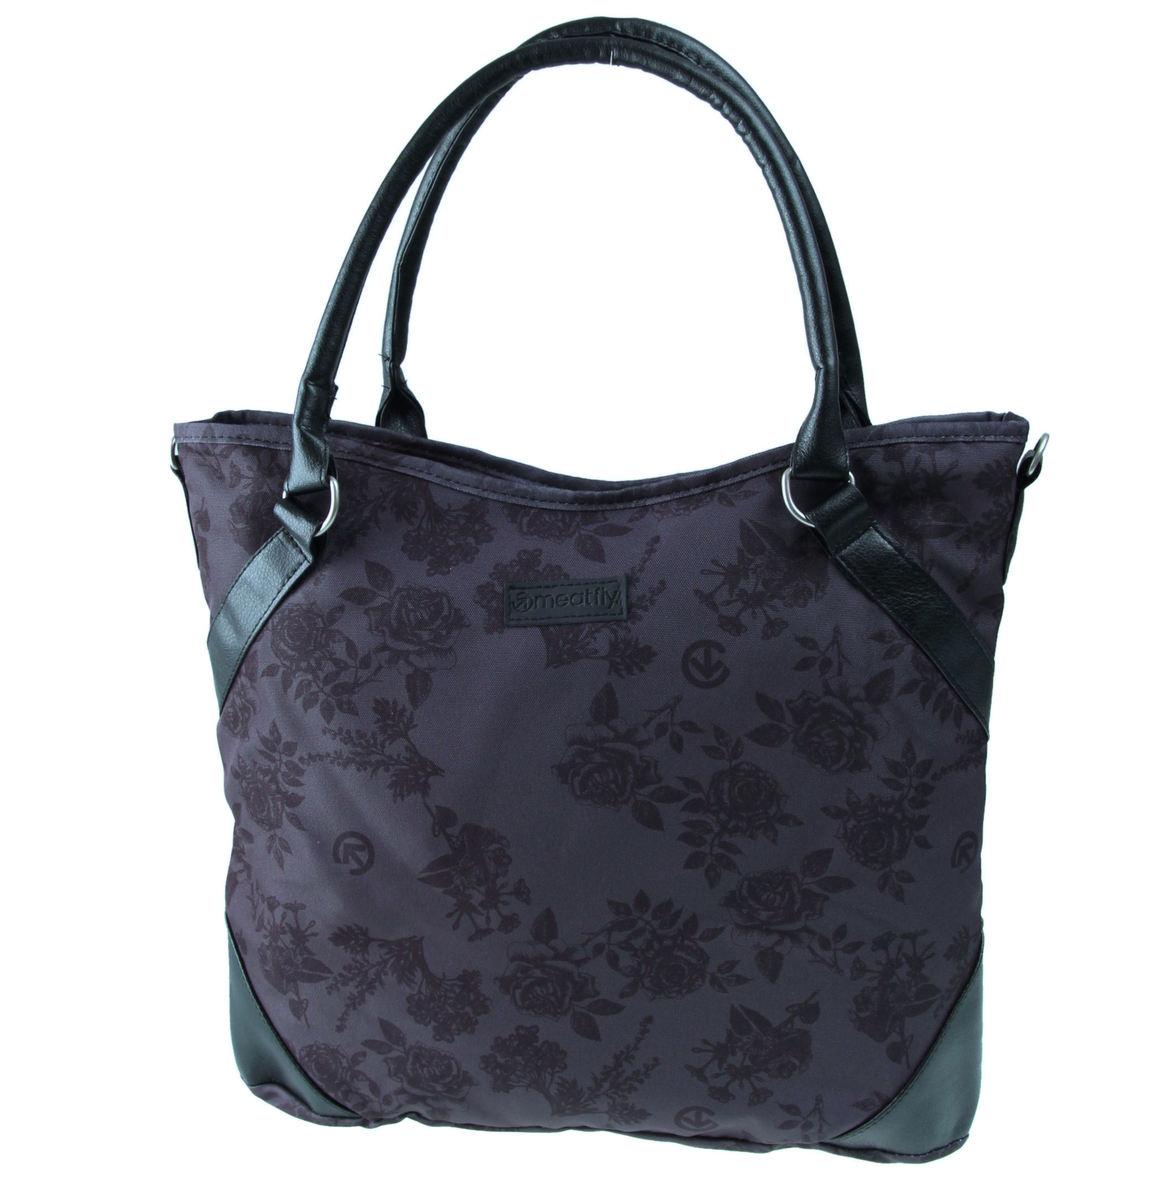 taška MEATFLY - Insanity 16 - Black Floral - MF-0401256141-16